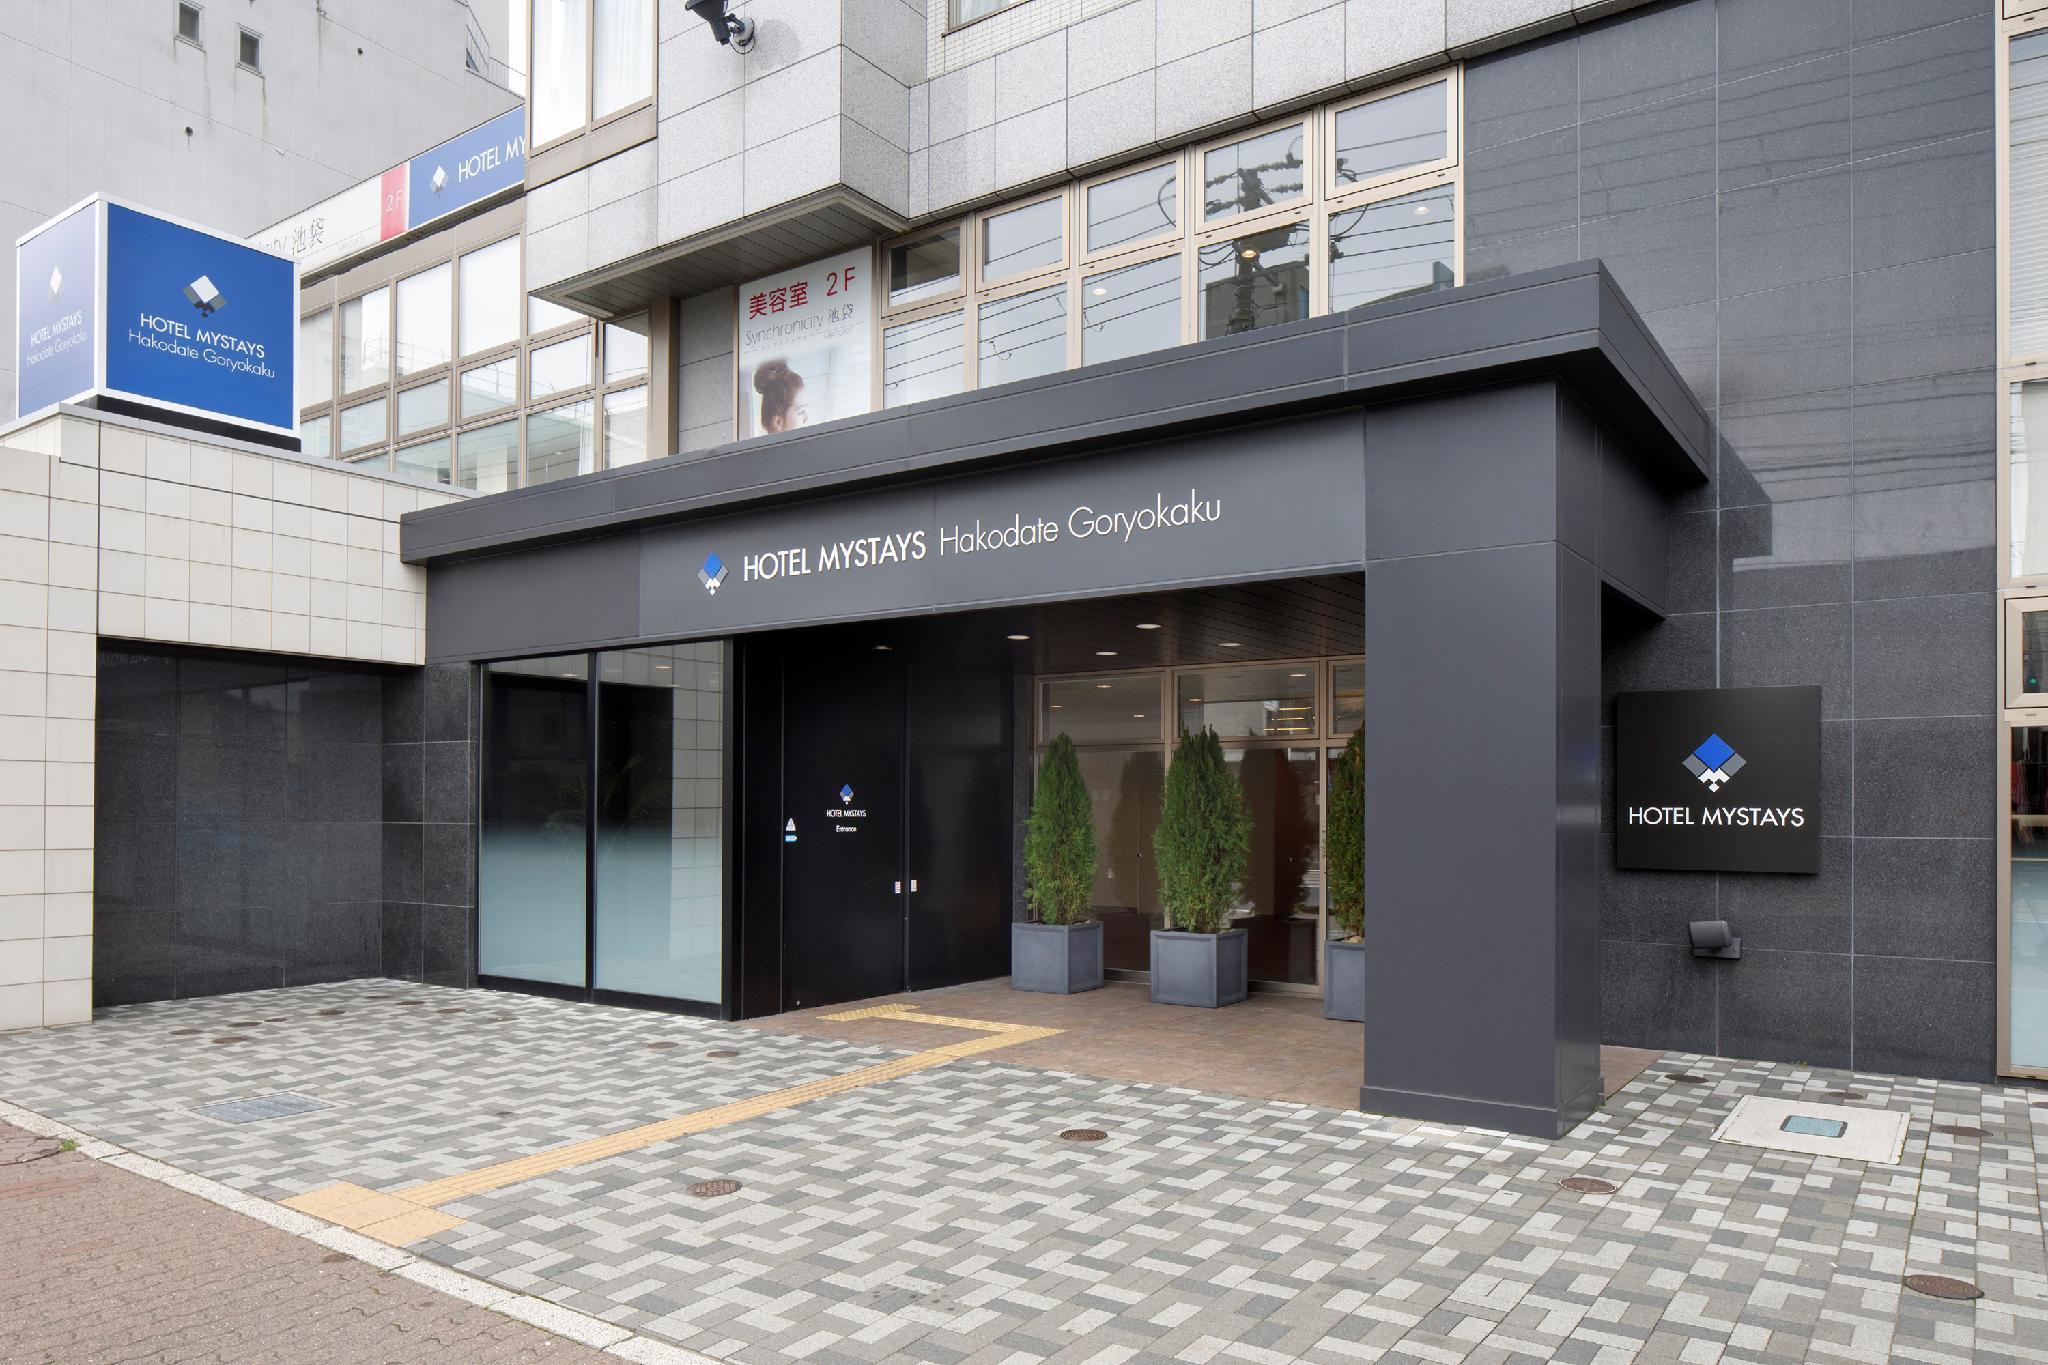 HOTEL MYSTAYS Hakodate Goryokaku